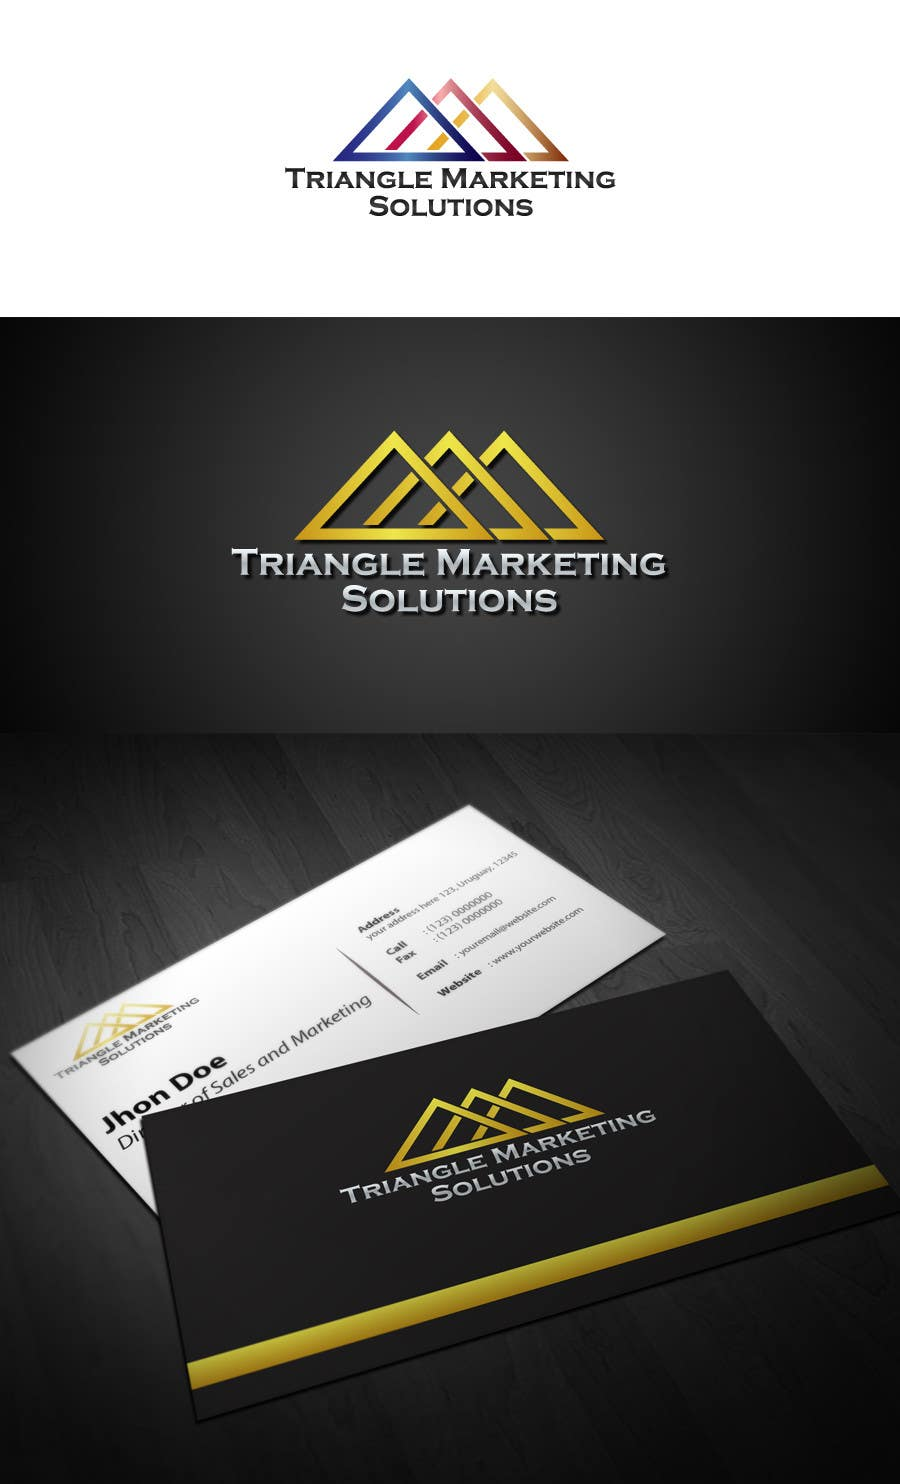 Penyertaan Peraduan #48 untuk Design a Logo for Traingle Marketing Solutions